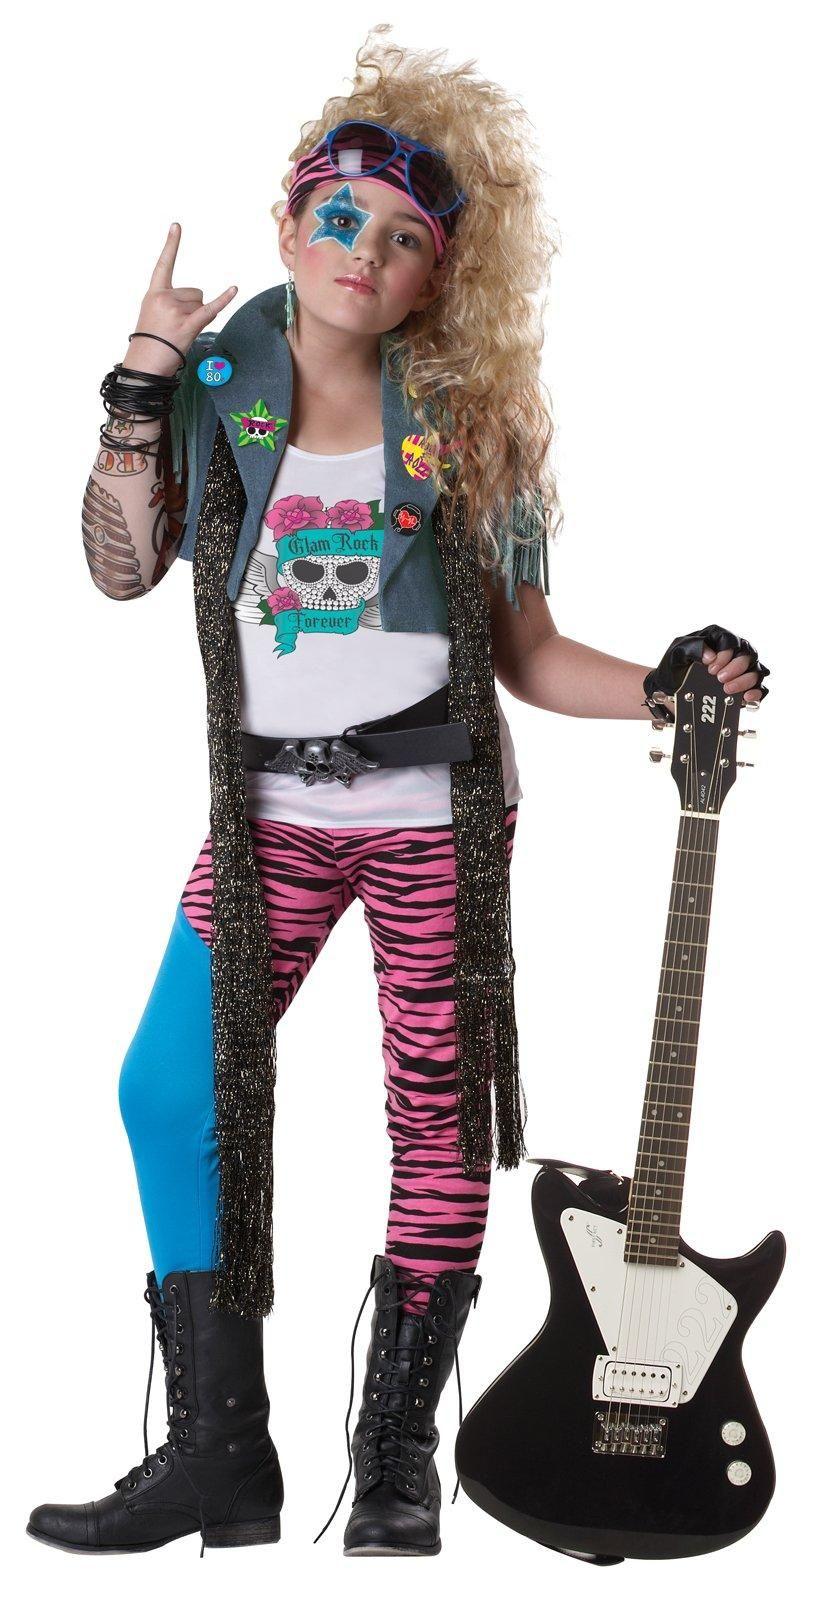 80's Glam Rocker Kids Costume from